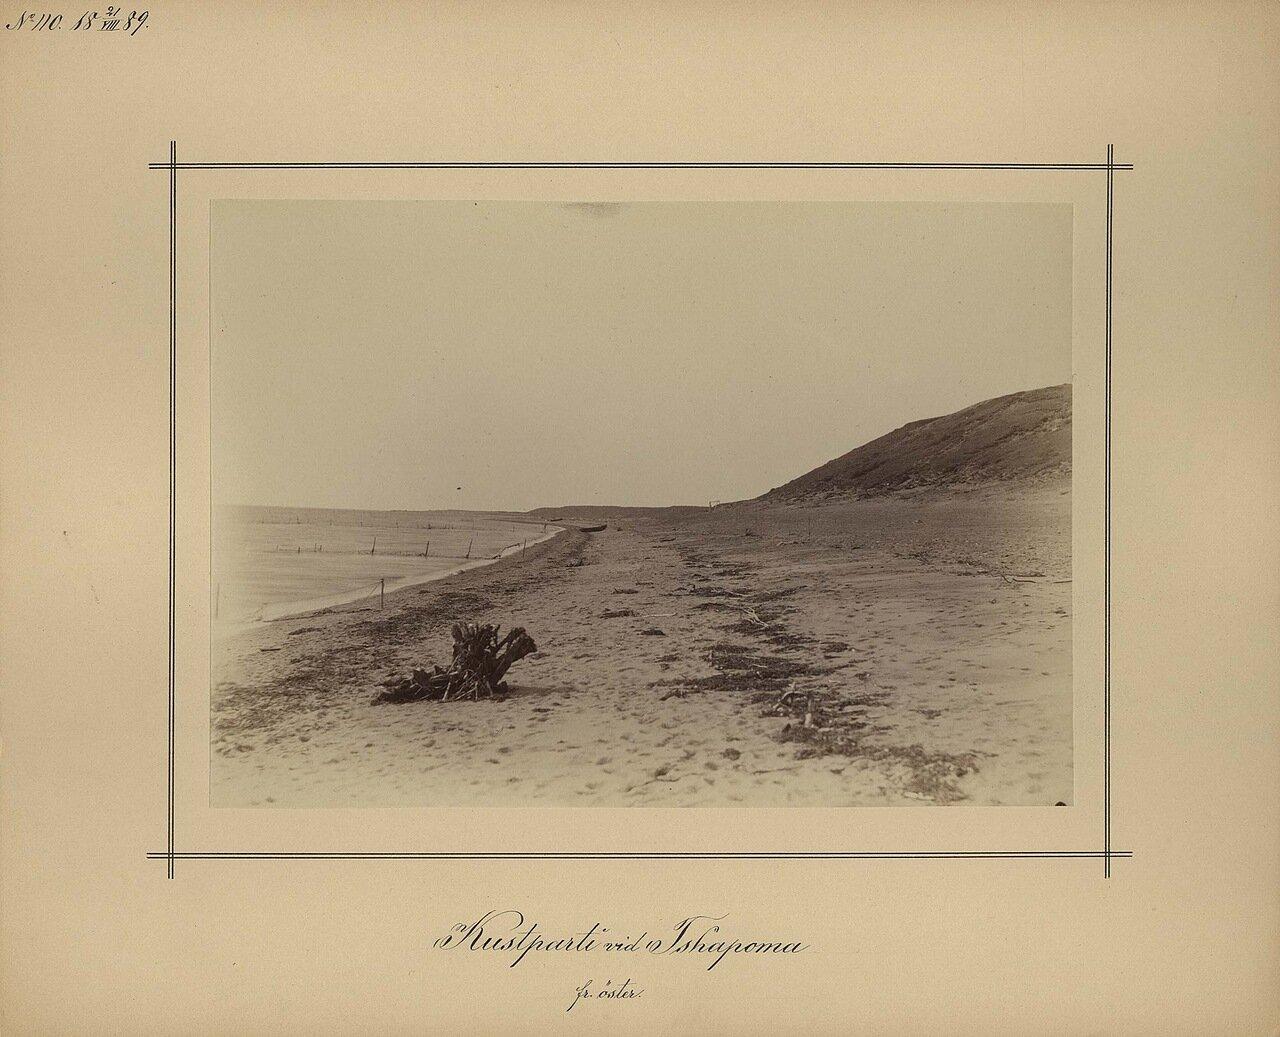 21.8.1889. Деревня Чапома, недалеко от Восточного побережья